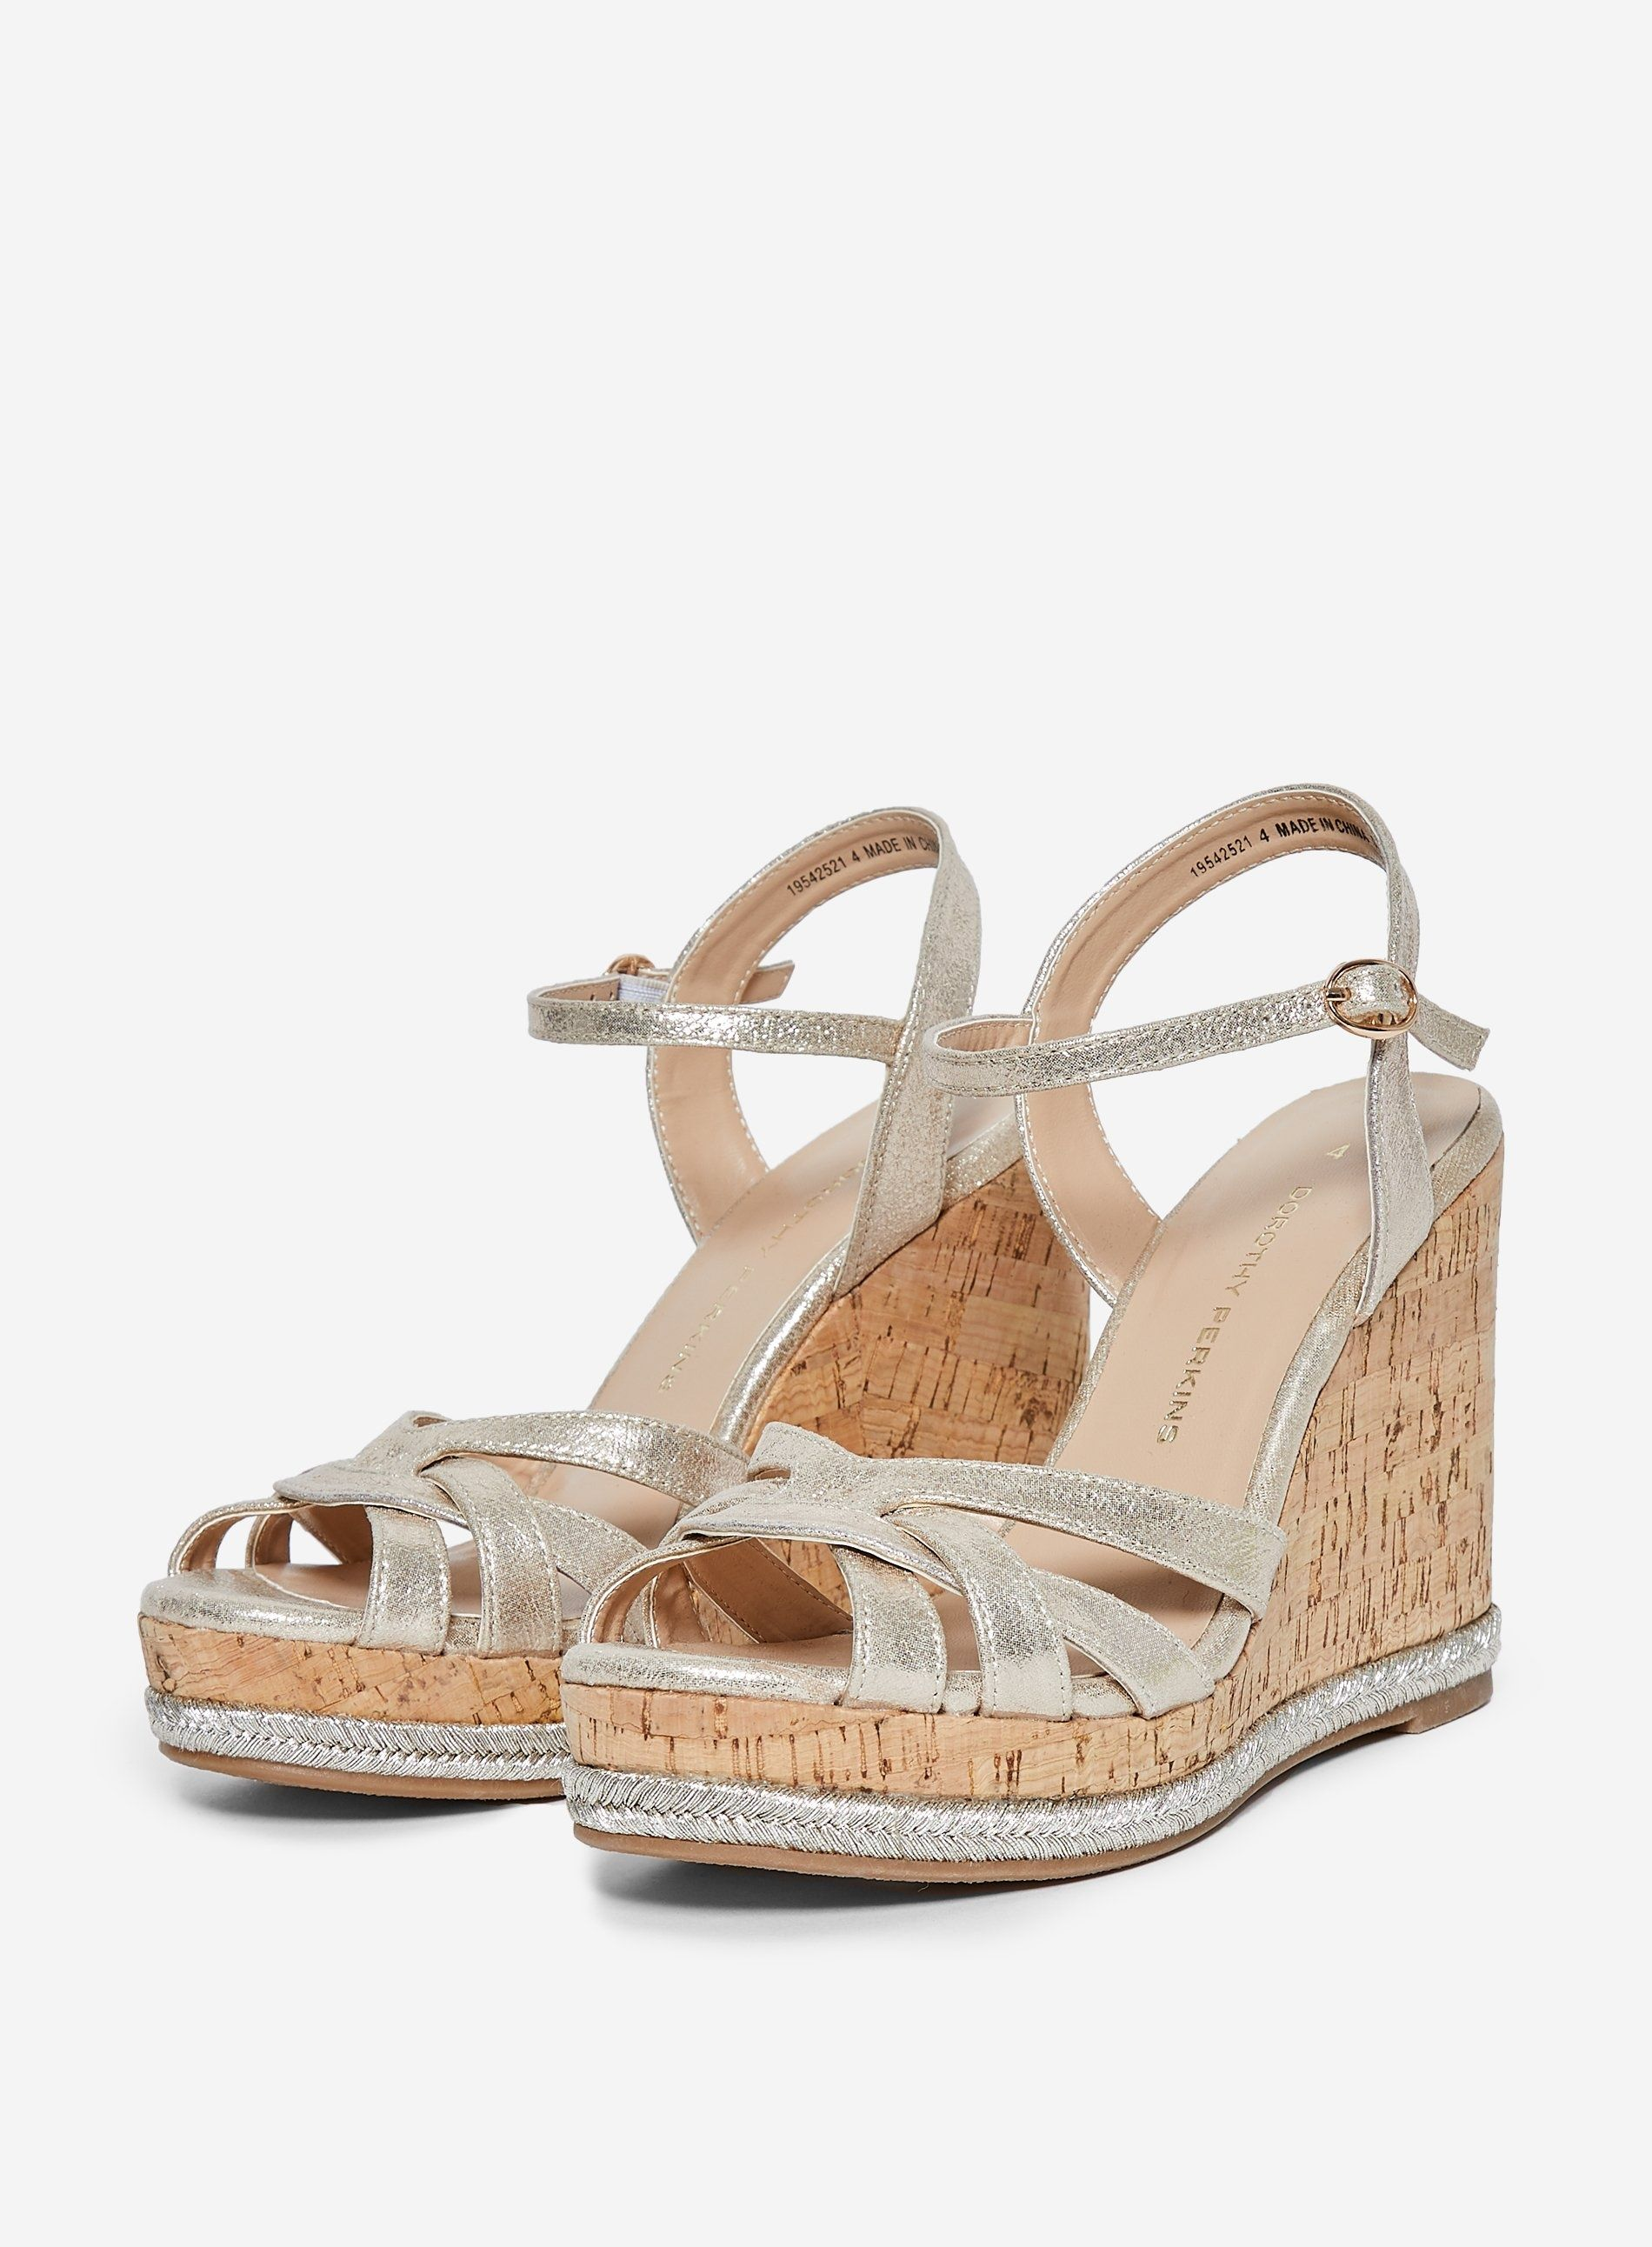 Dorothy Perkins Womens Silver Rhoda Wedge Platform Sandals Heels Open Toe